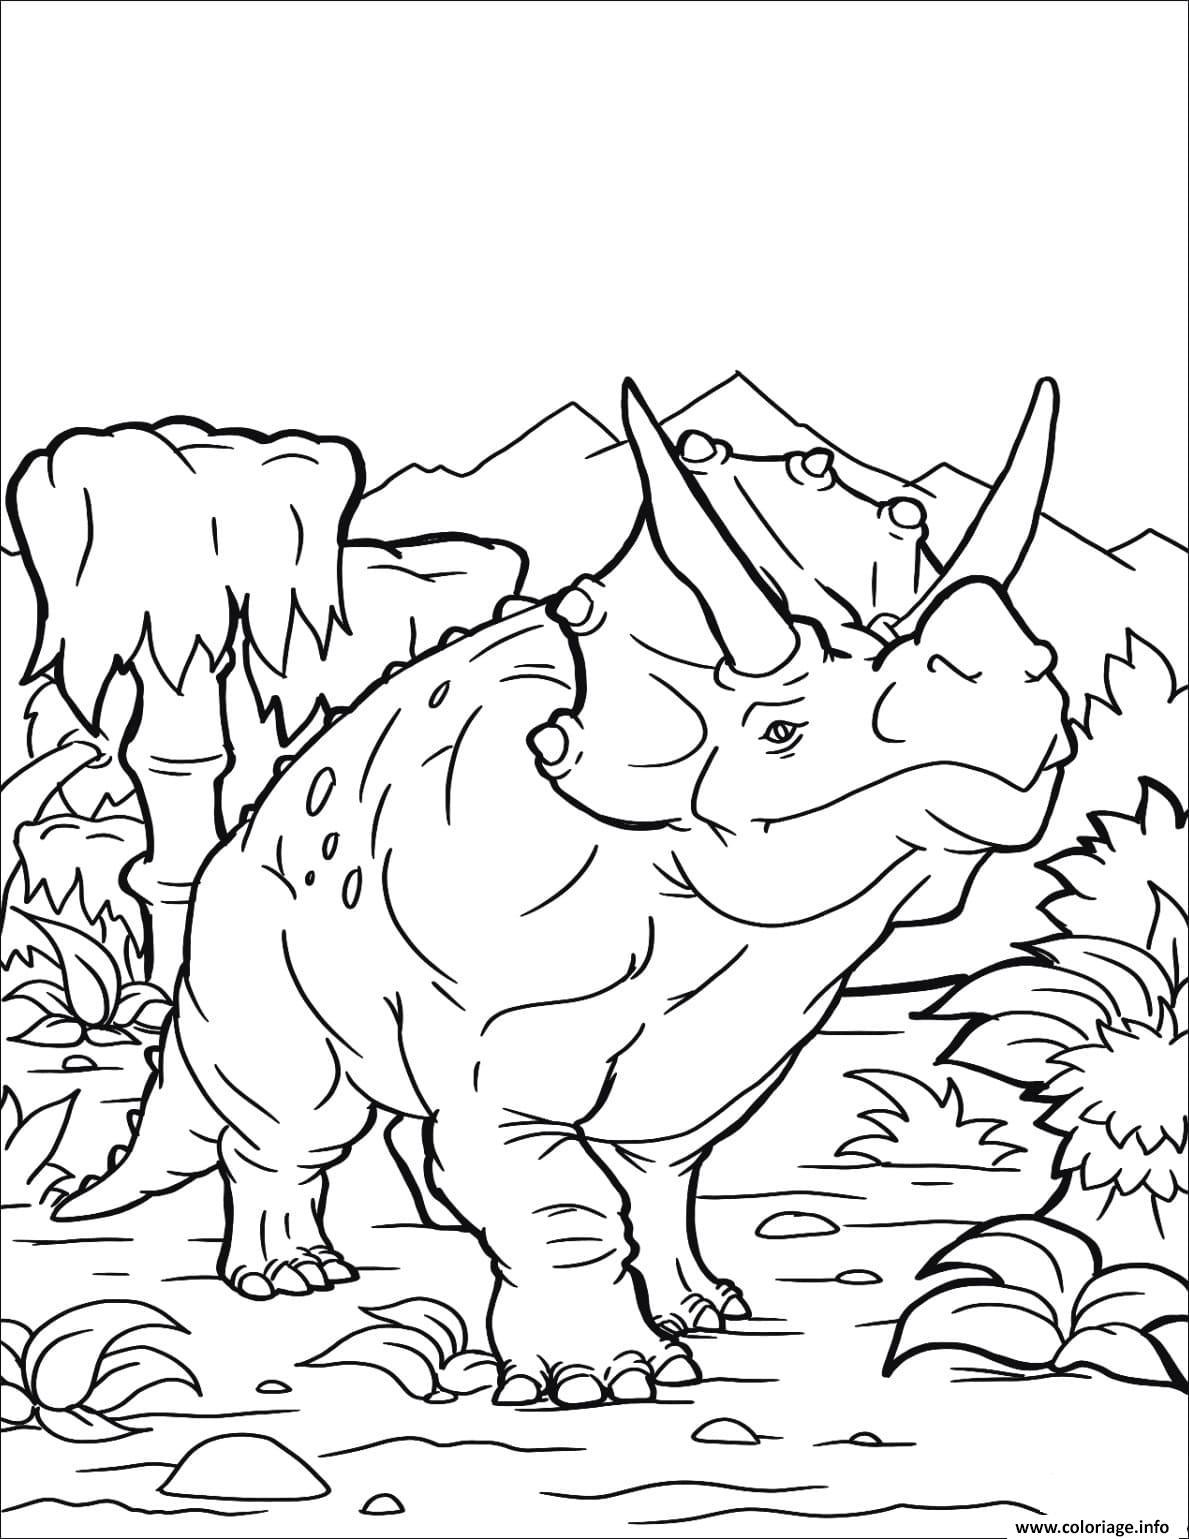 Coloriage Triceratops Dinosaure Jecolorie Com